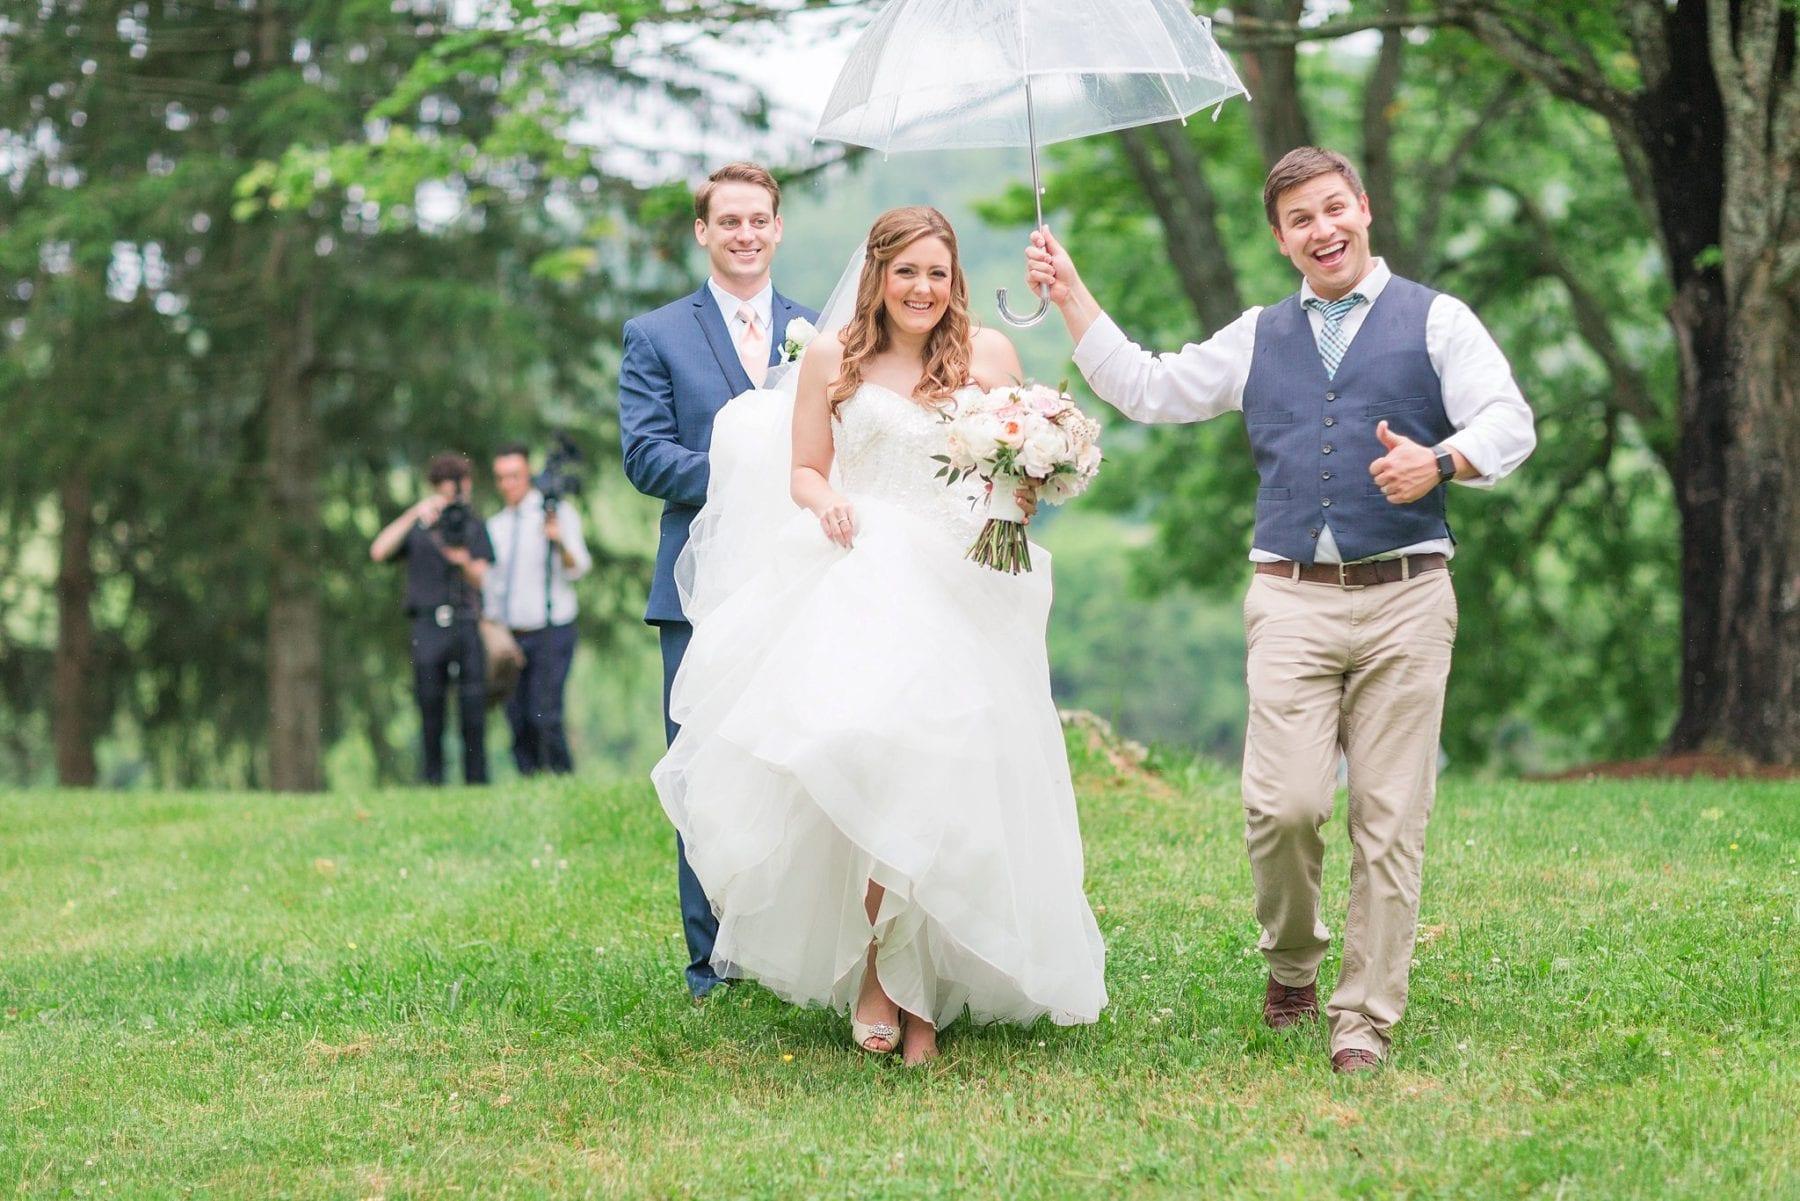 Justin & Megan Big Spring Farm Wedding Photos-191.jpg